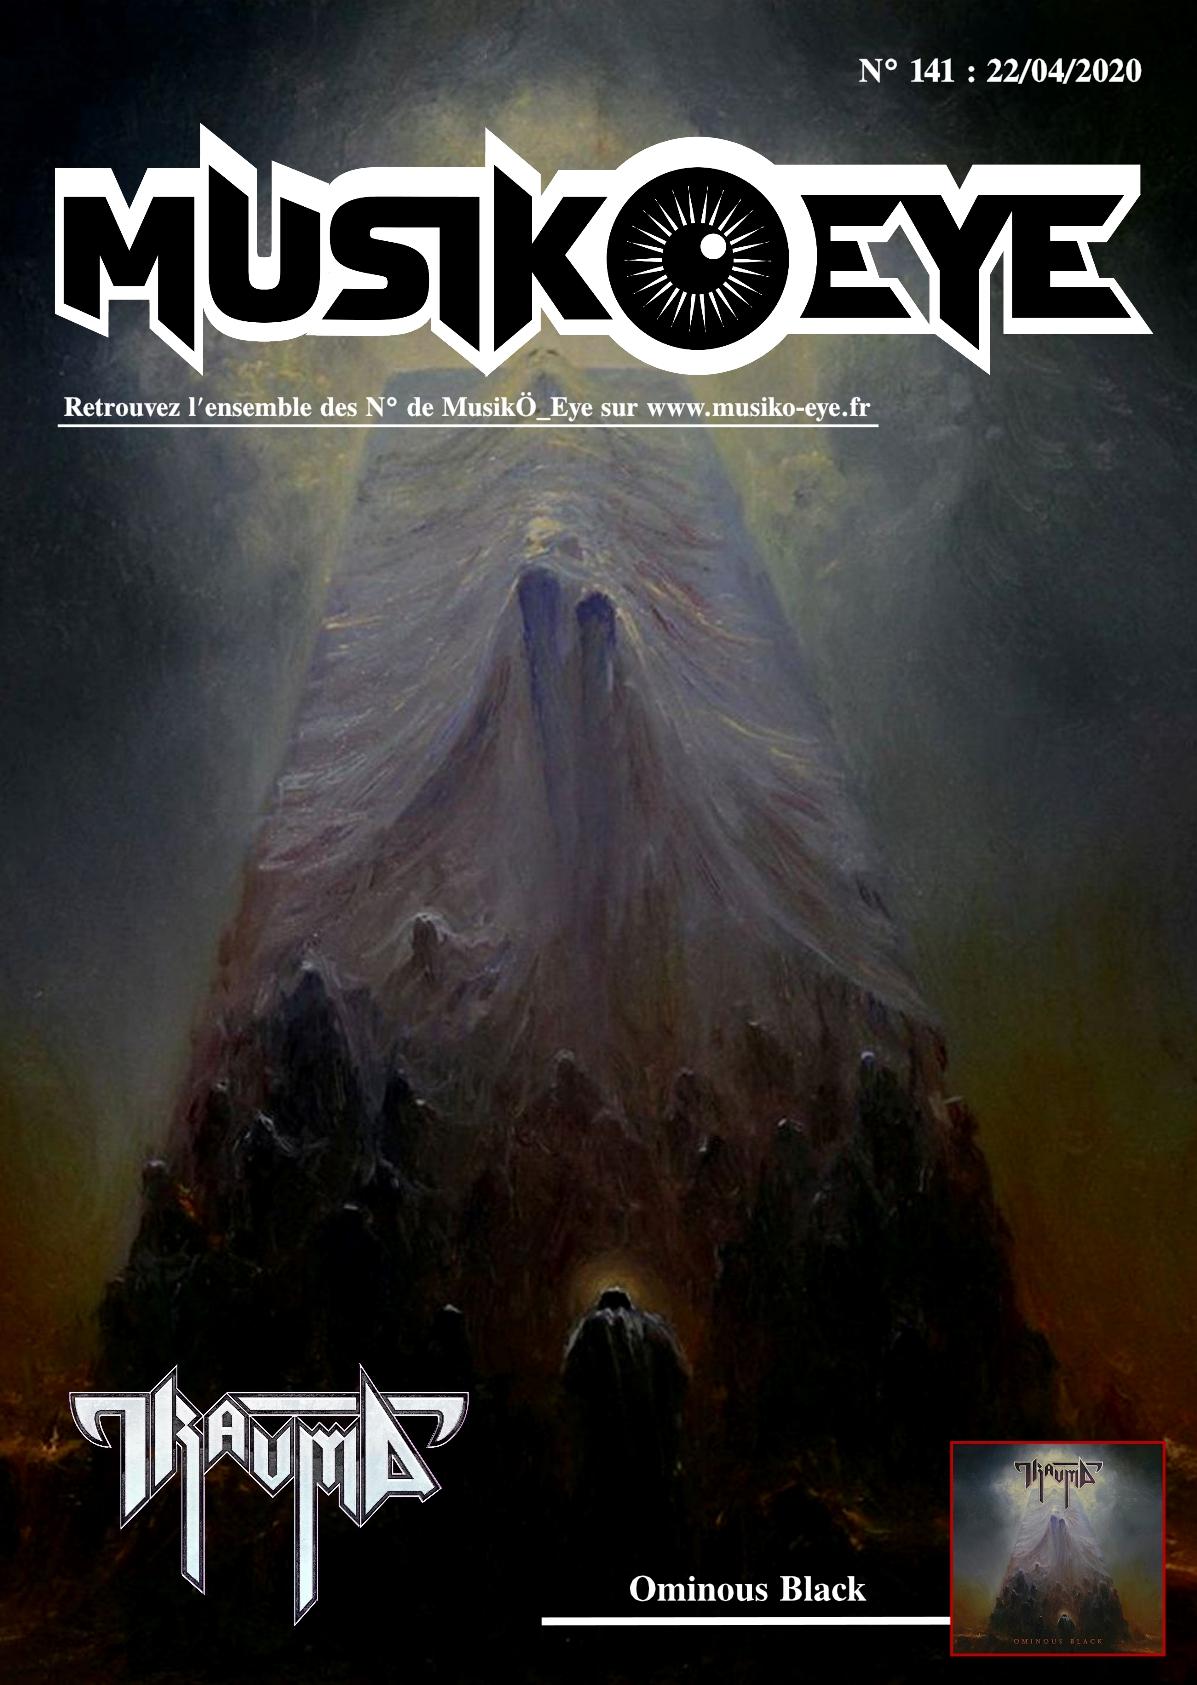 MusikÖ_Eye #141 – TRAUMA